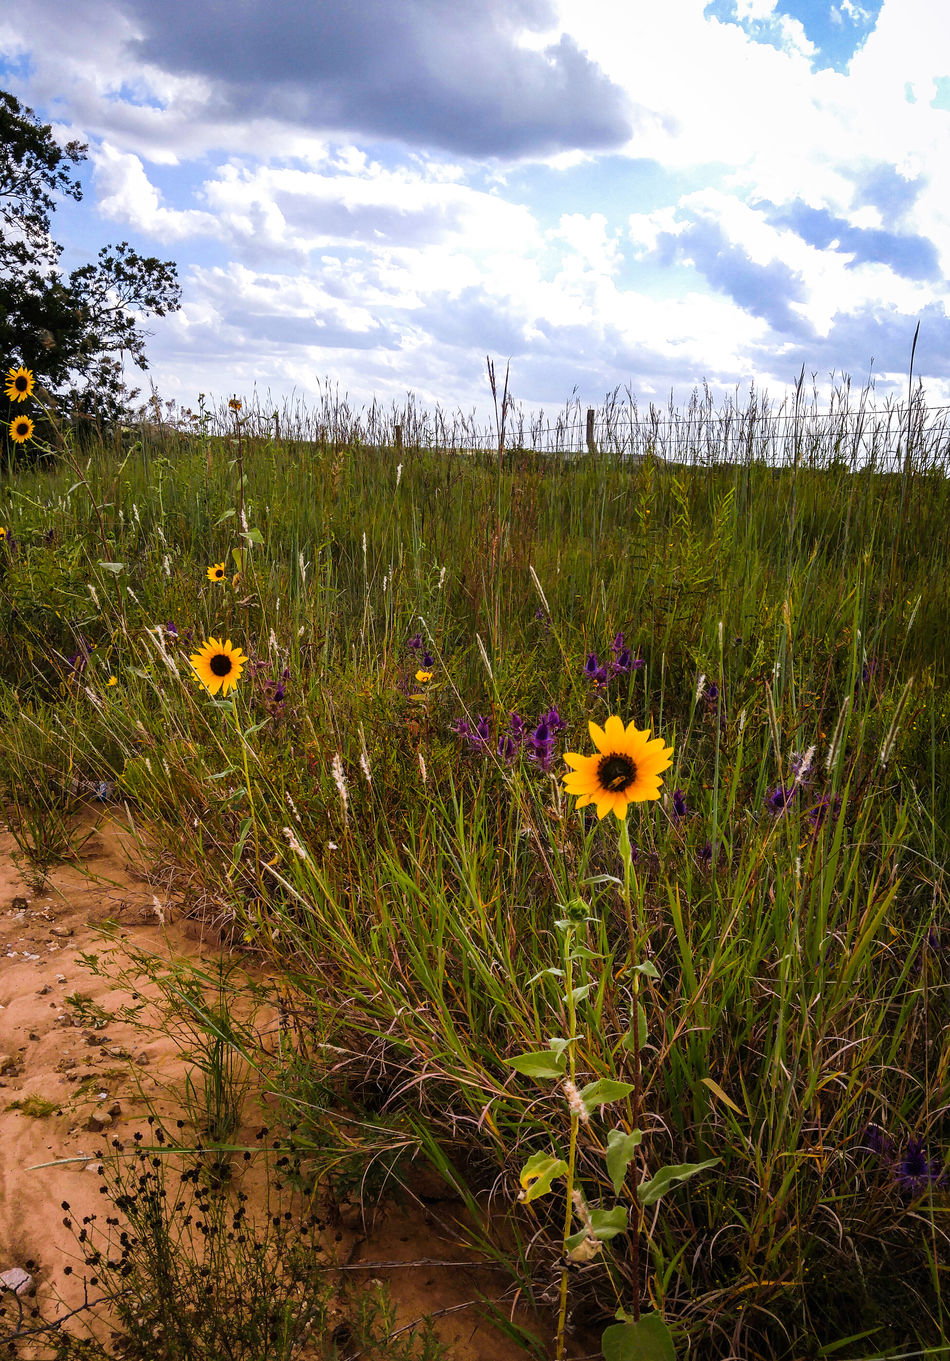 Roadside Wildflowers Nature Flower Scenics No People Landscape Rural Scene Gravel Roads Beauty In Nature Tranquil Scene Kansas EyeEmNewHere